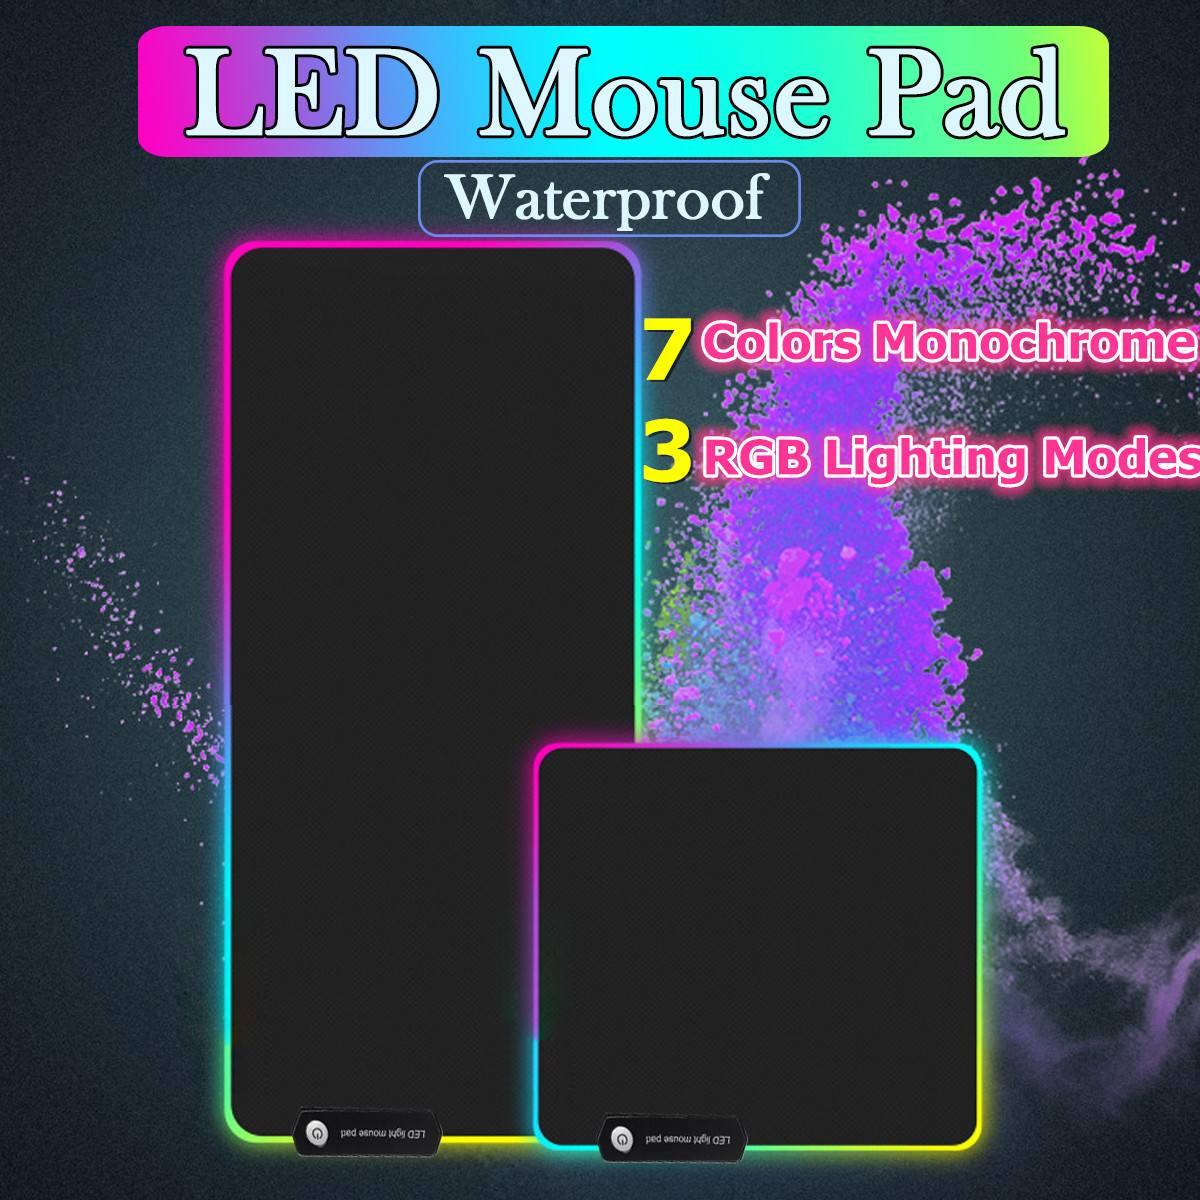 Large RGB LED Gaming Mouse Pad Gamer Mousepad LED Light Illuminated USB Wired Colorful Luminous Non-Slip Mouse Mice